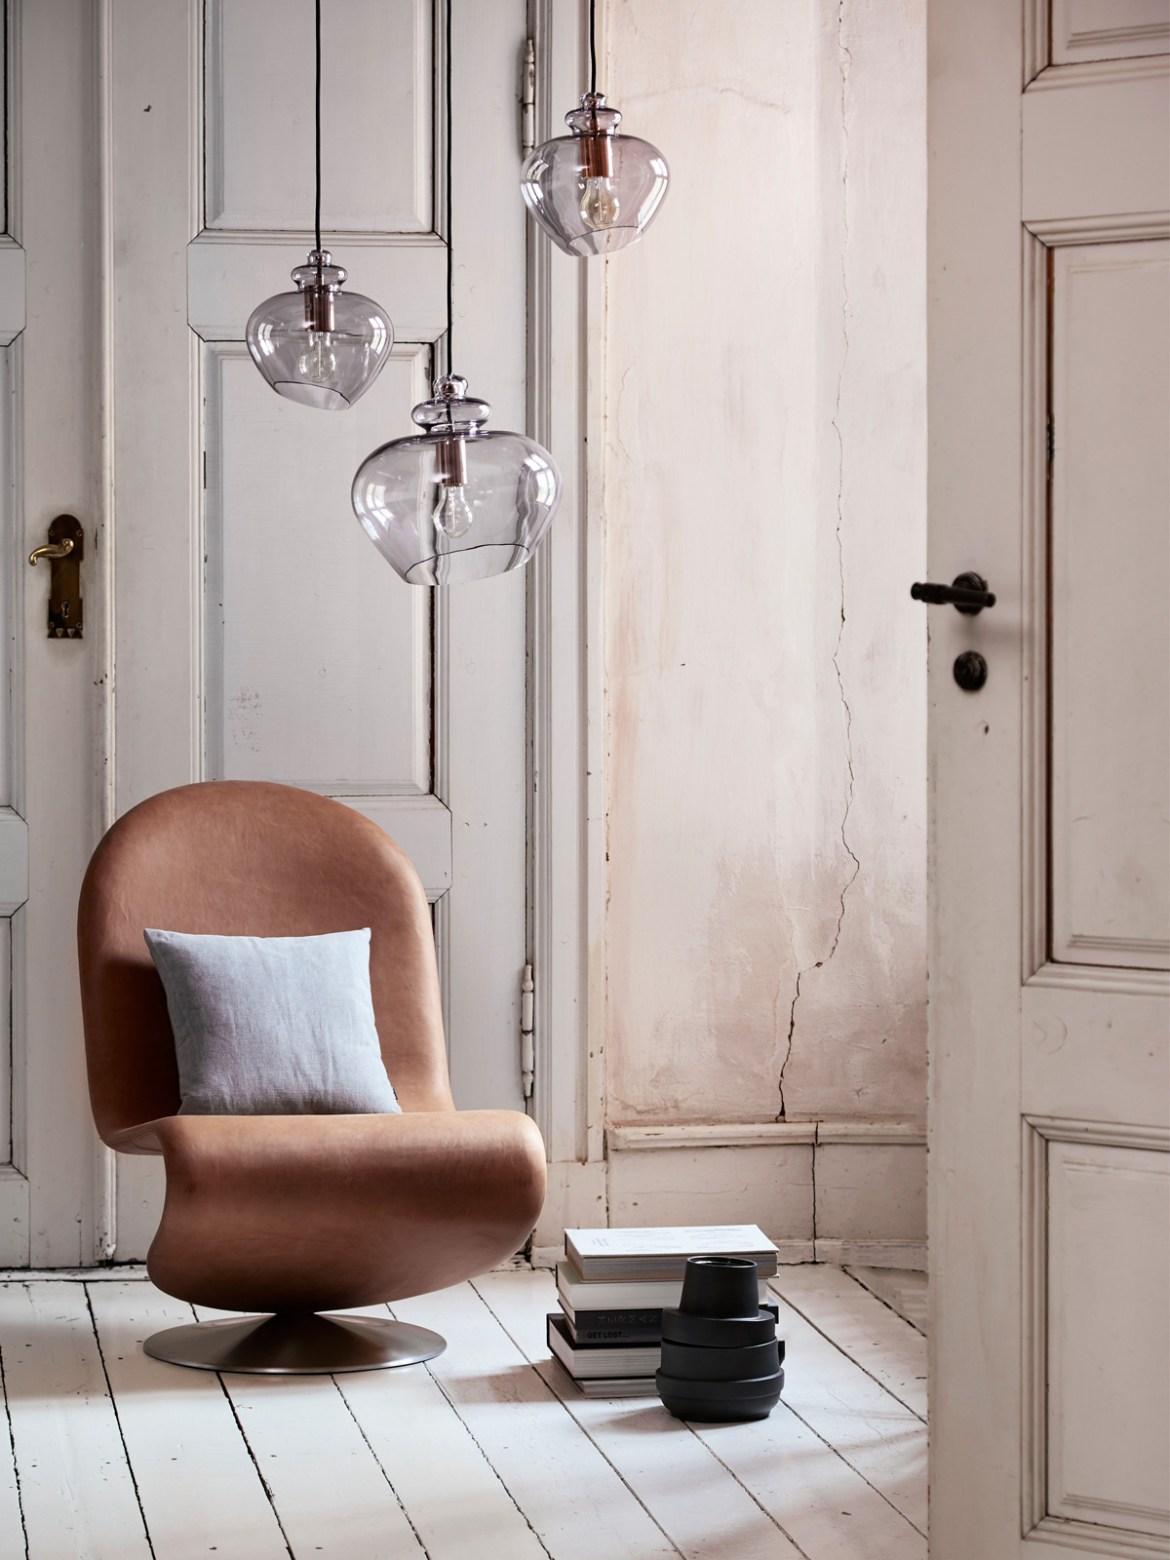 DesignOrt Blog: Leseleuchten Frandsen Glaslampe Grace bei DesignOrt Berlin